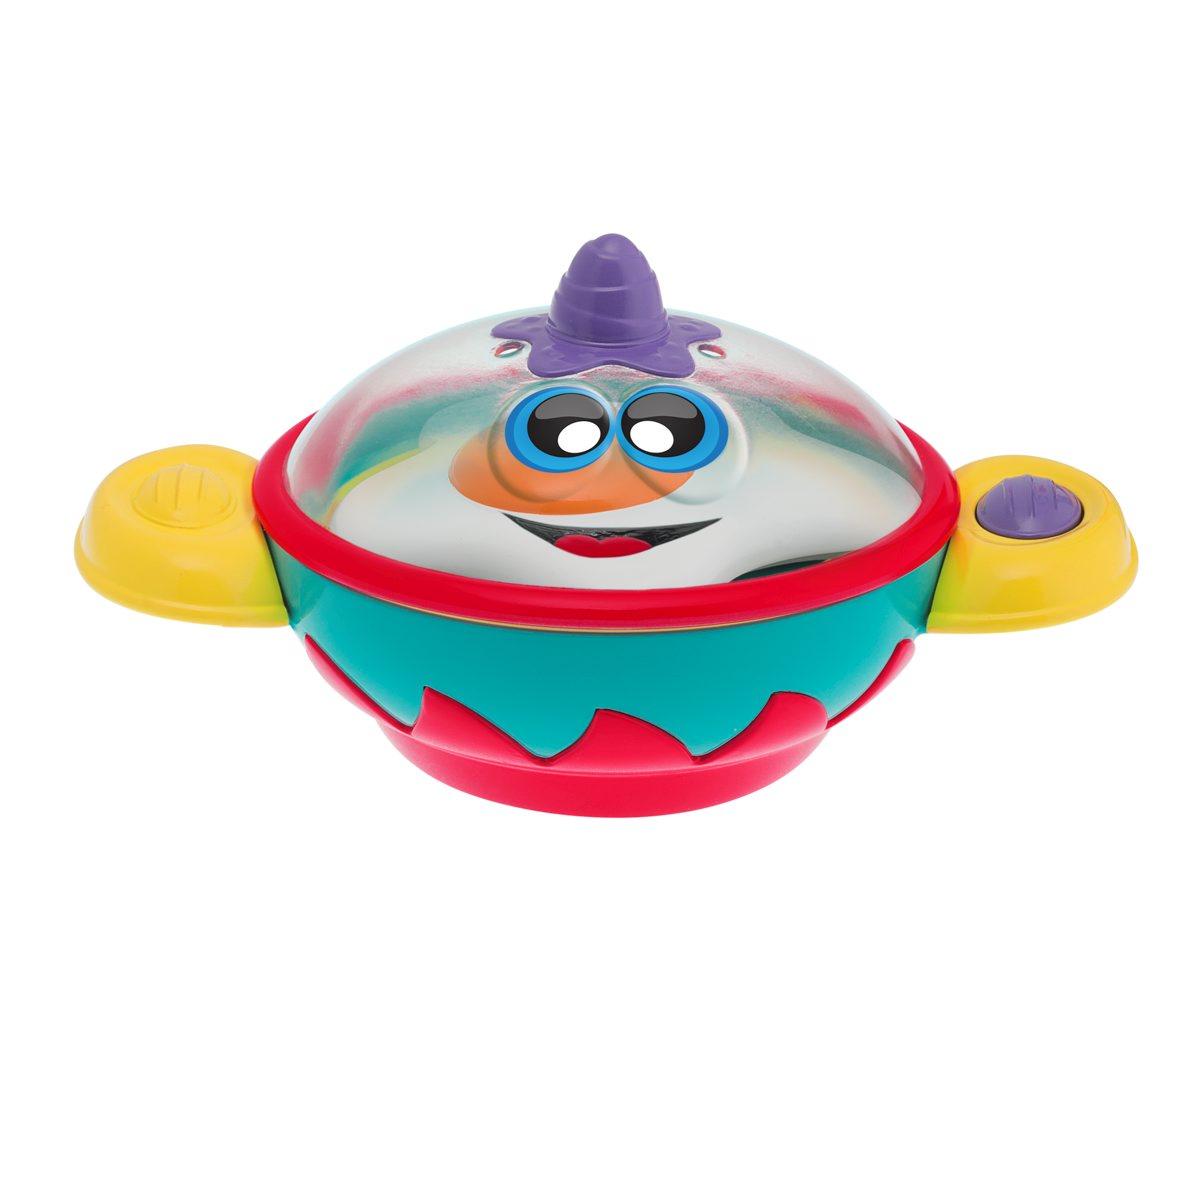 Chicco Музыкальная игрушка Кастрюлька00007683000000